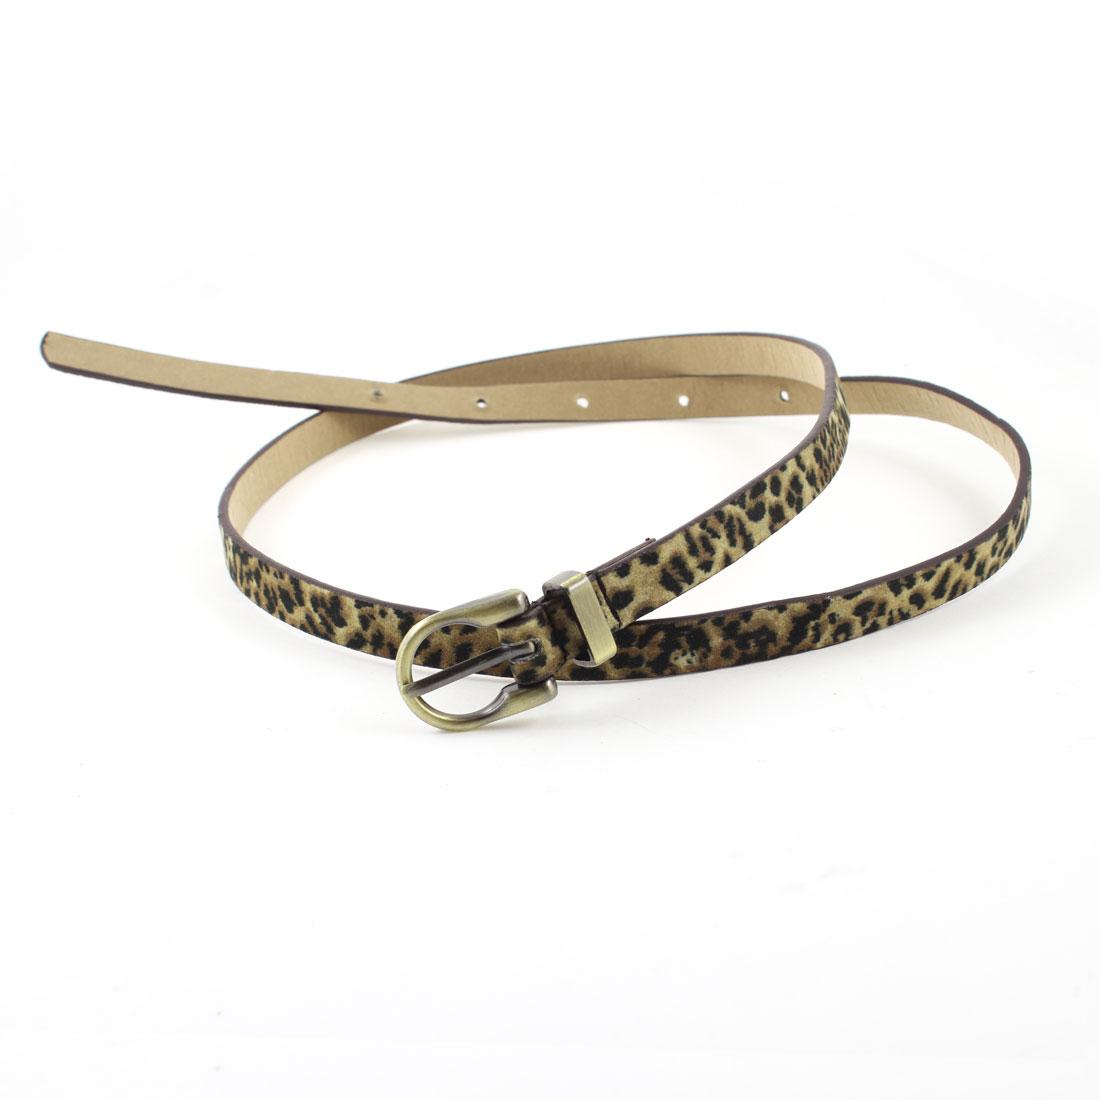 Woman Blouse Trousers Decor Leopard Pattern Faux Leather Waist Belt Black